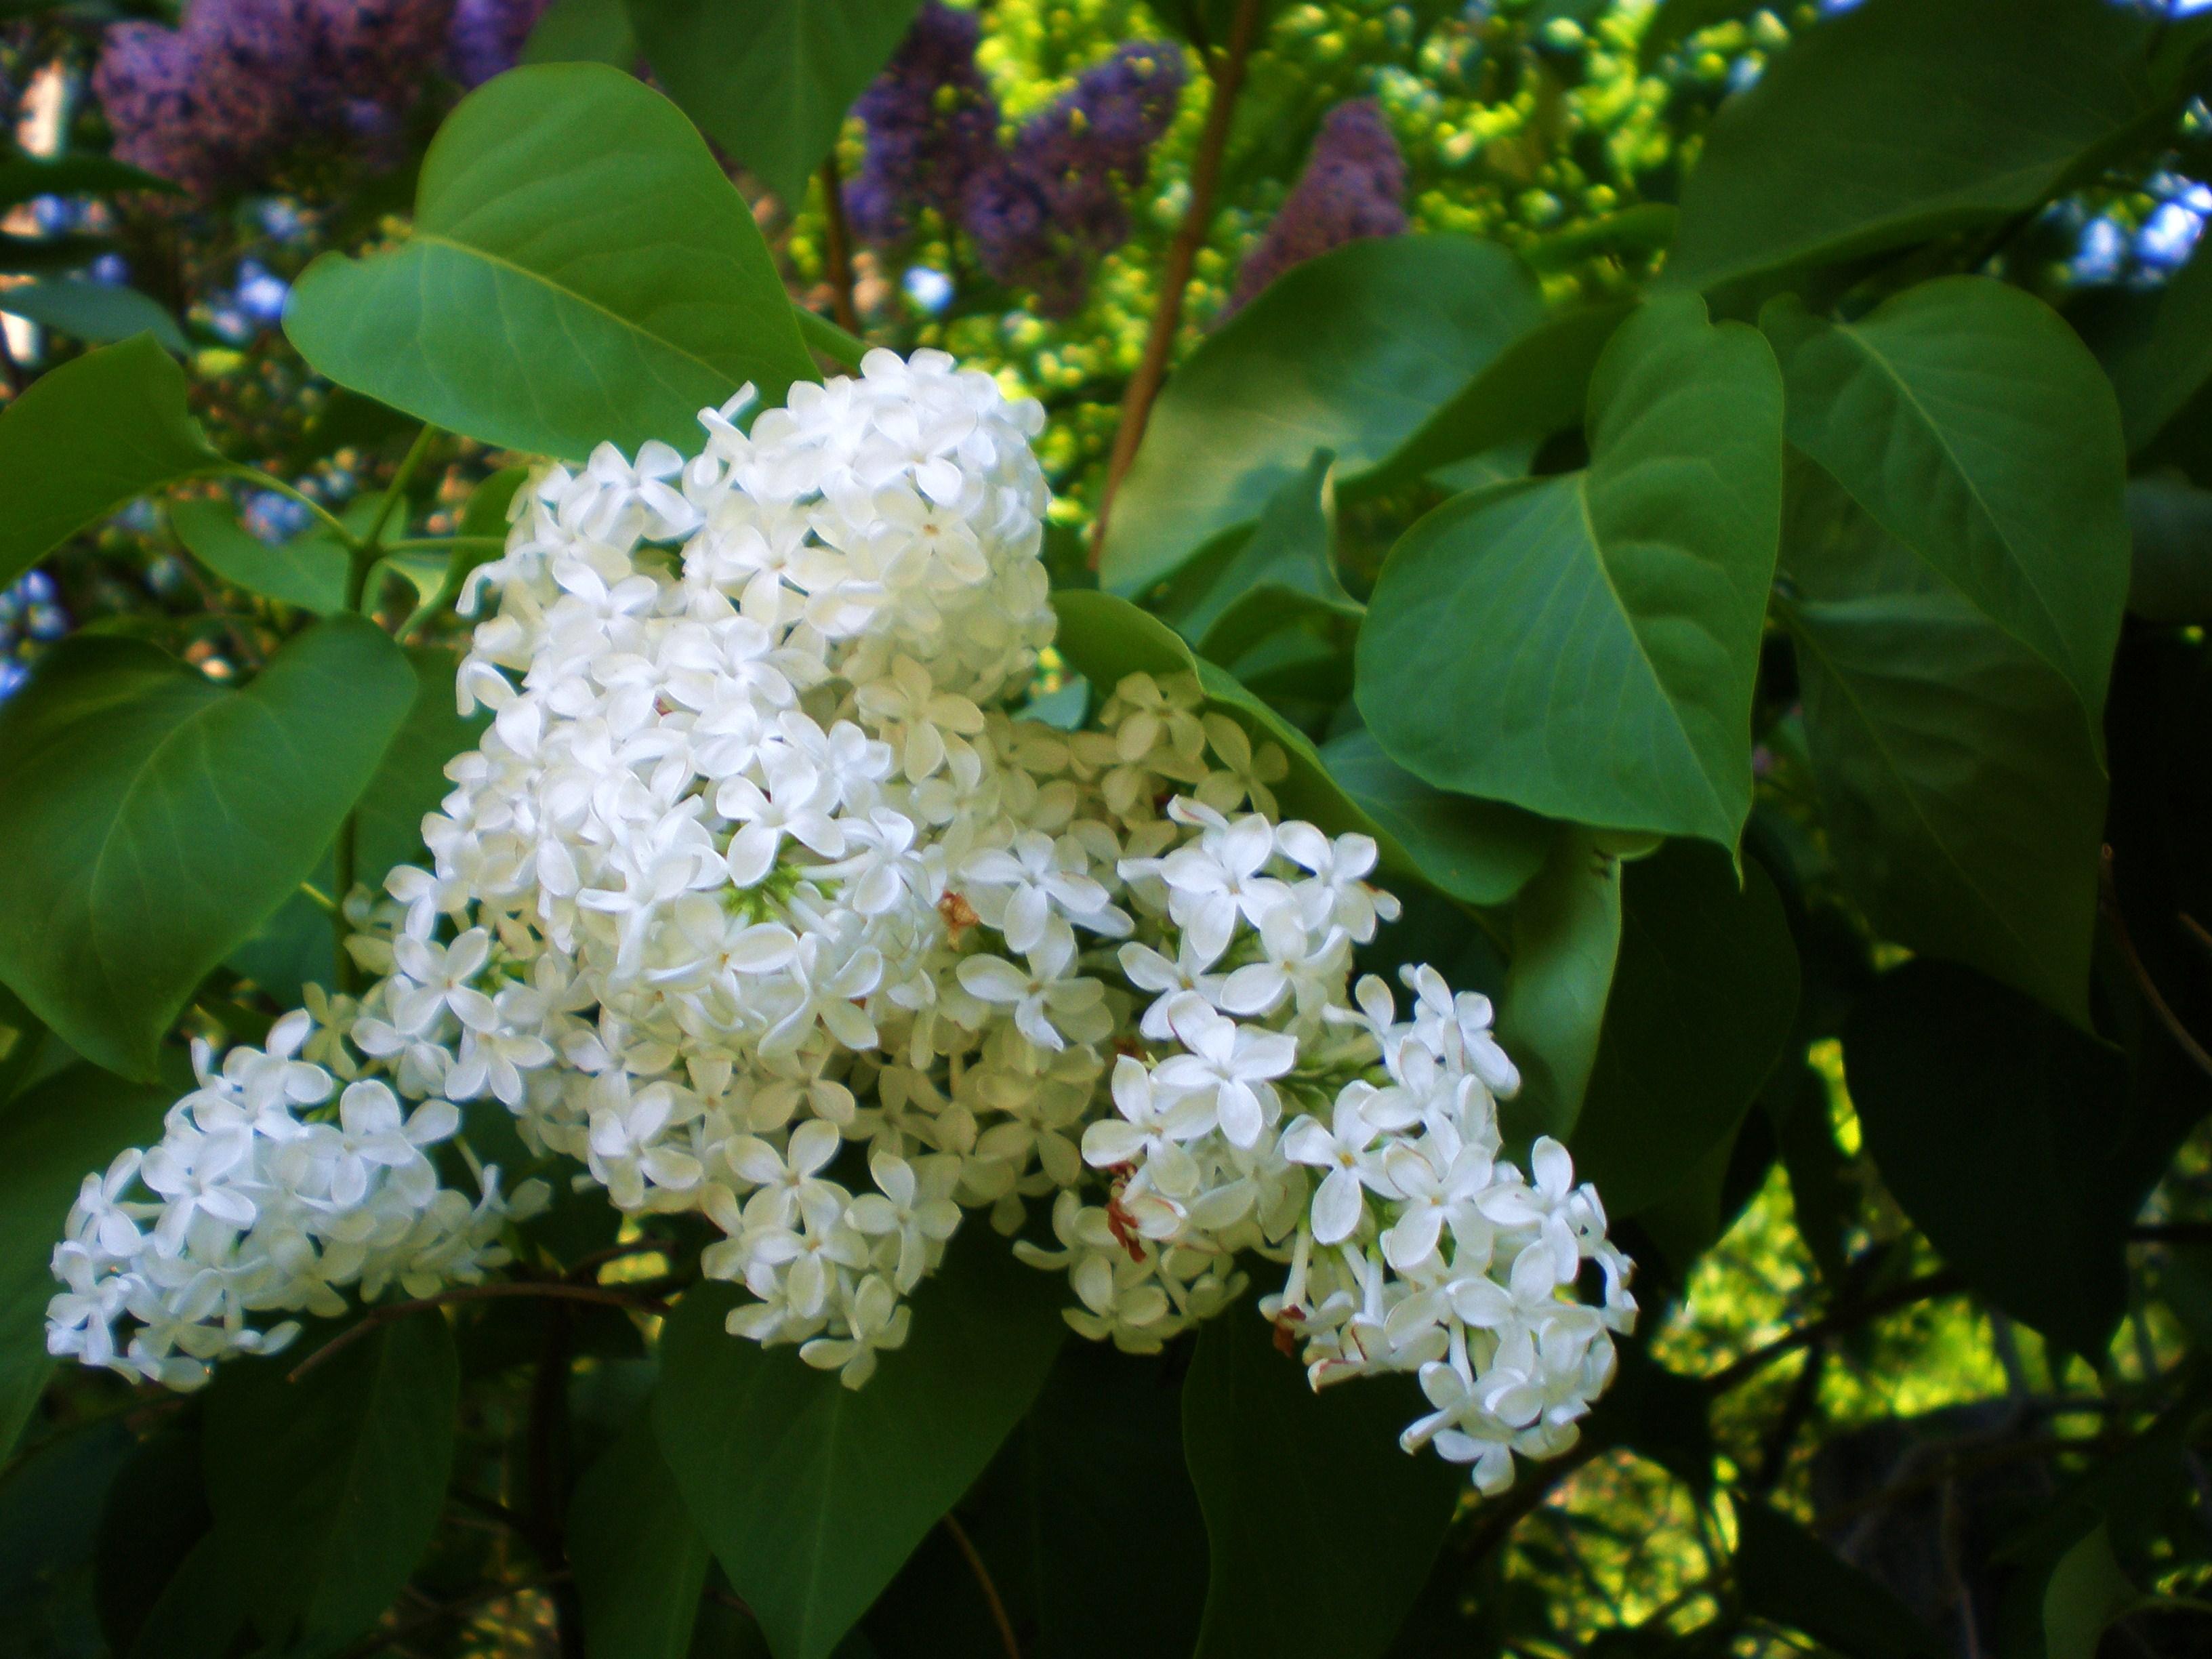 Flowering Shrubs Rose Cottage Gardens And Farm